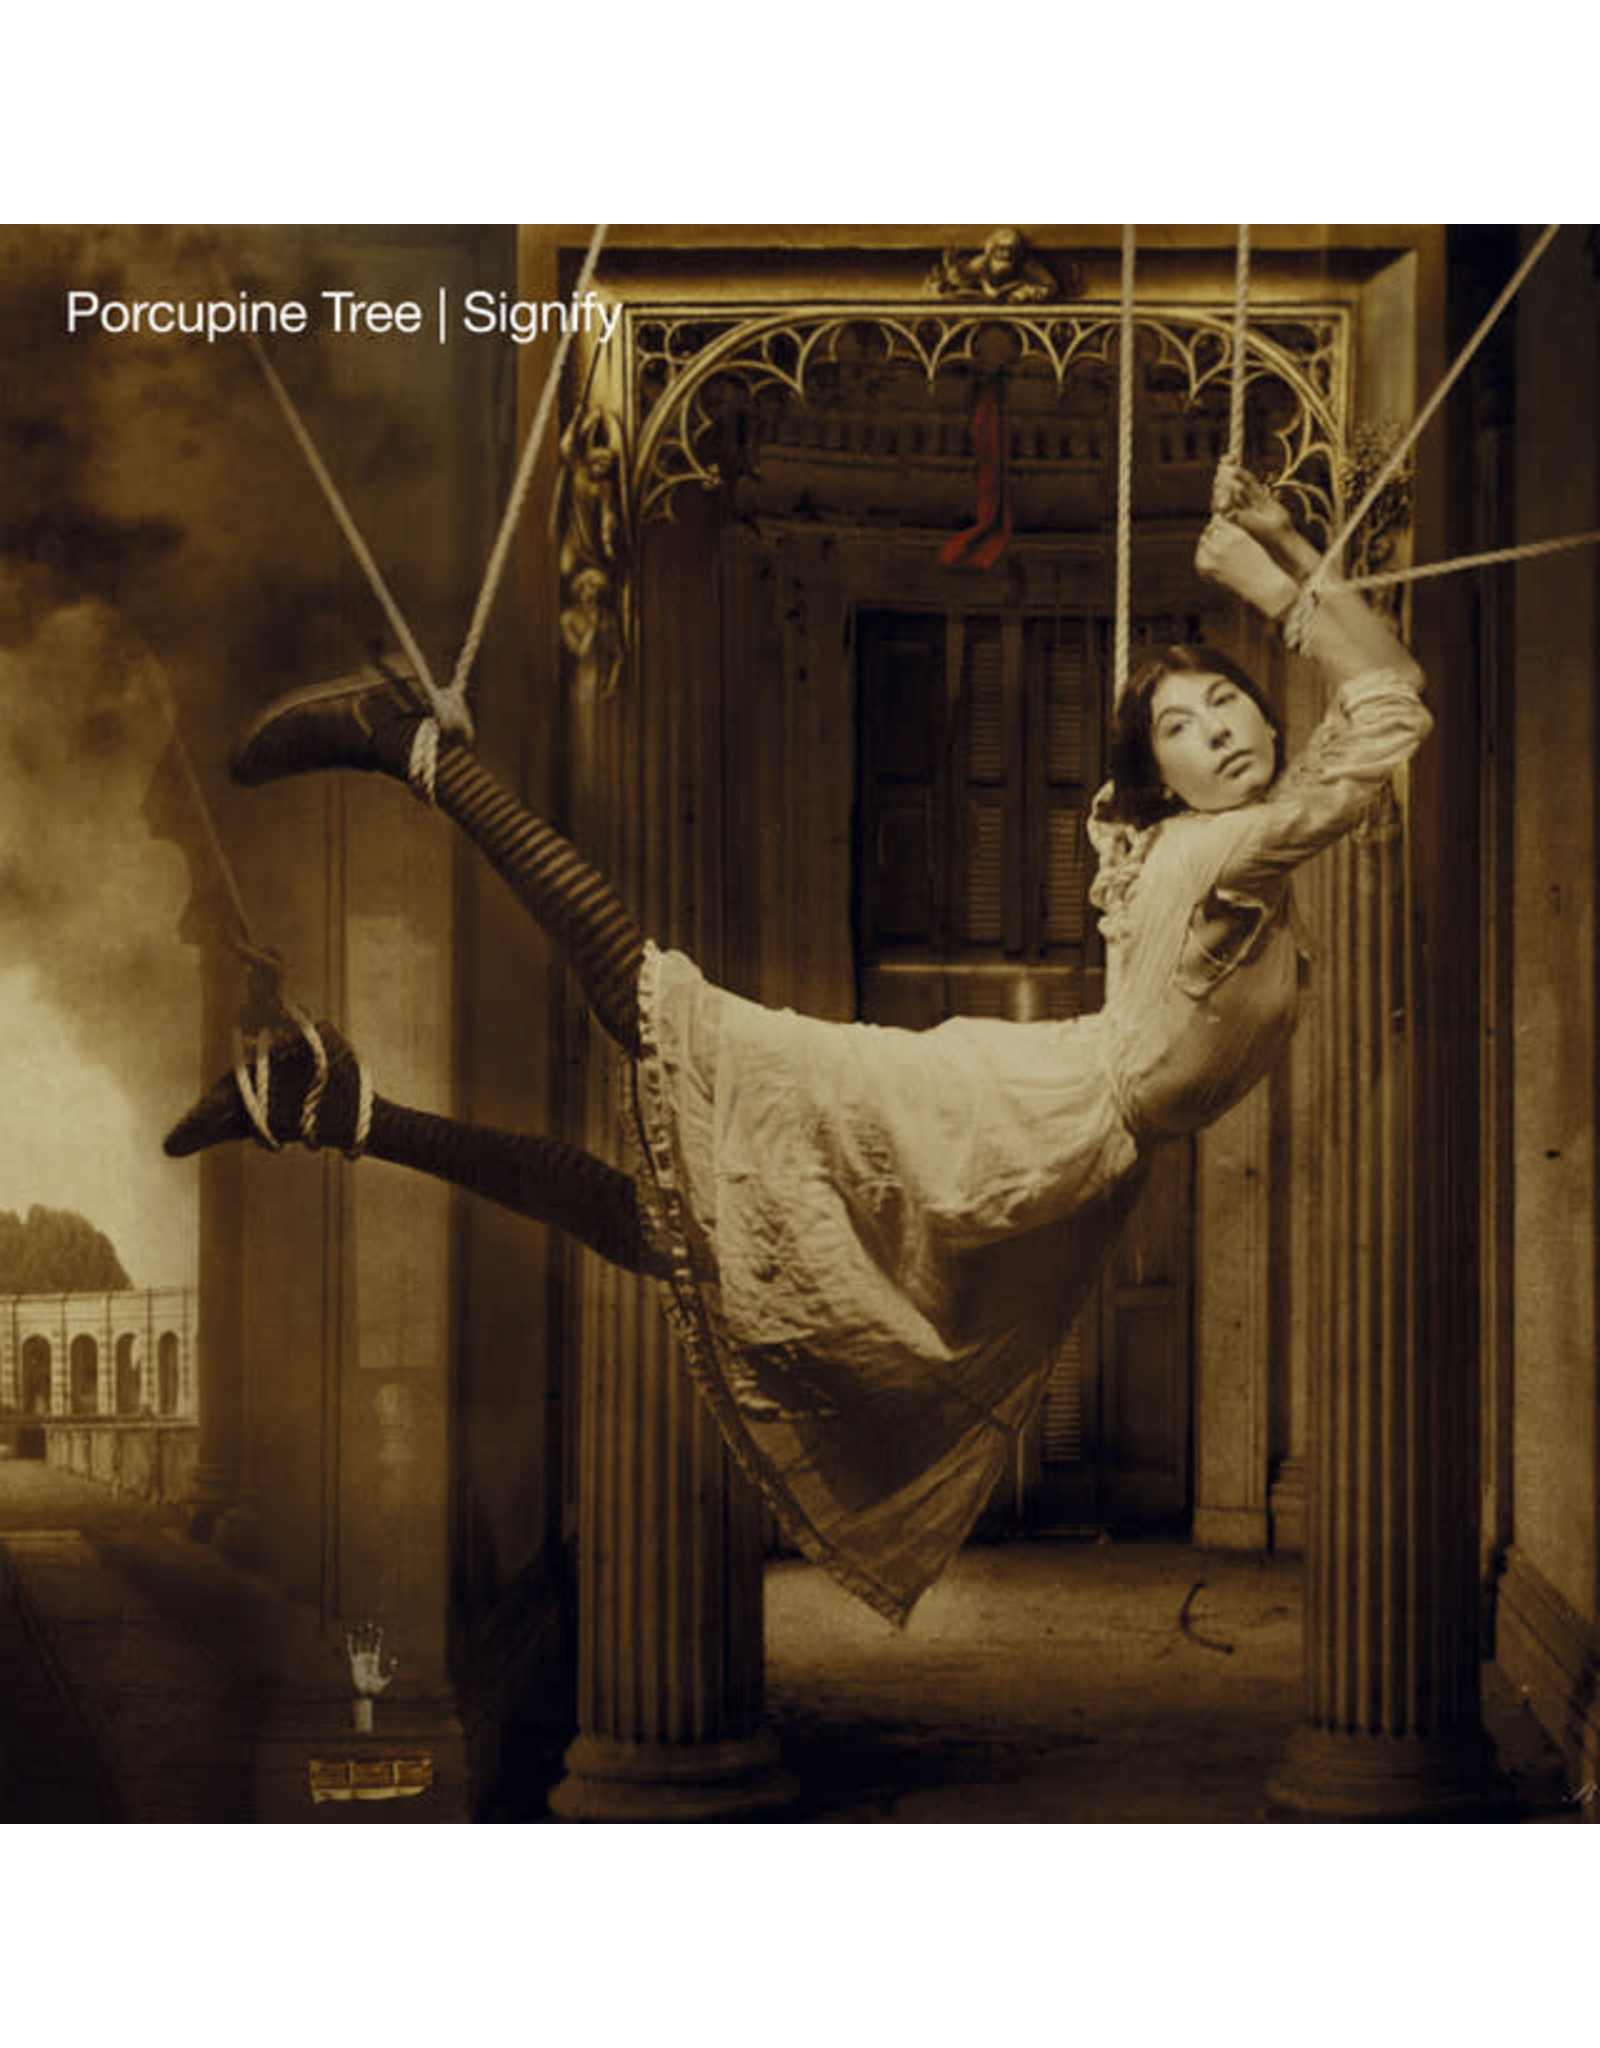 Vinyl Porcupine Tree - Signify  Final Sale